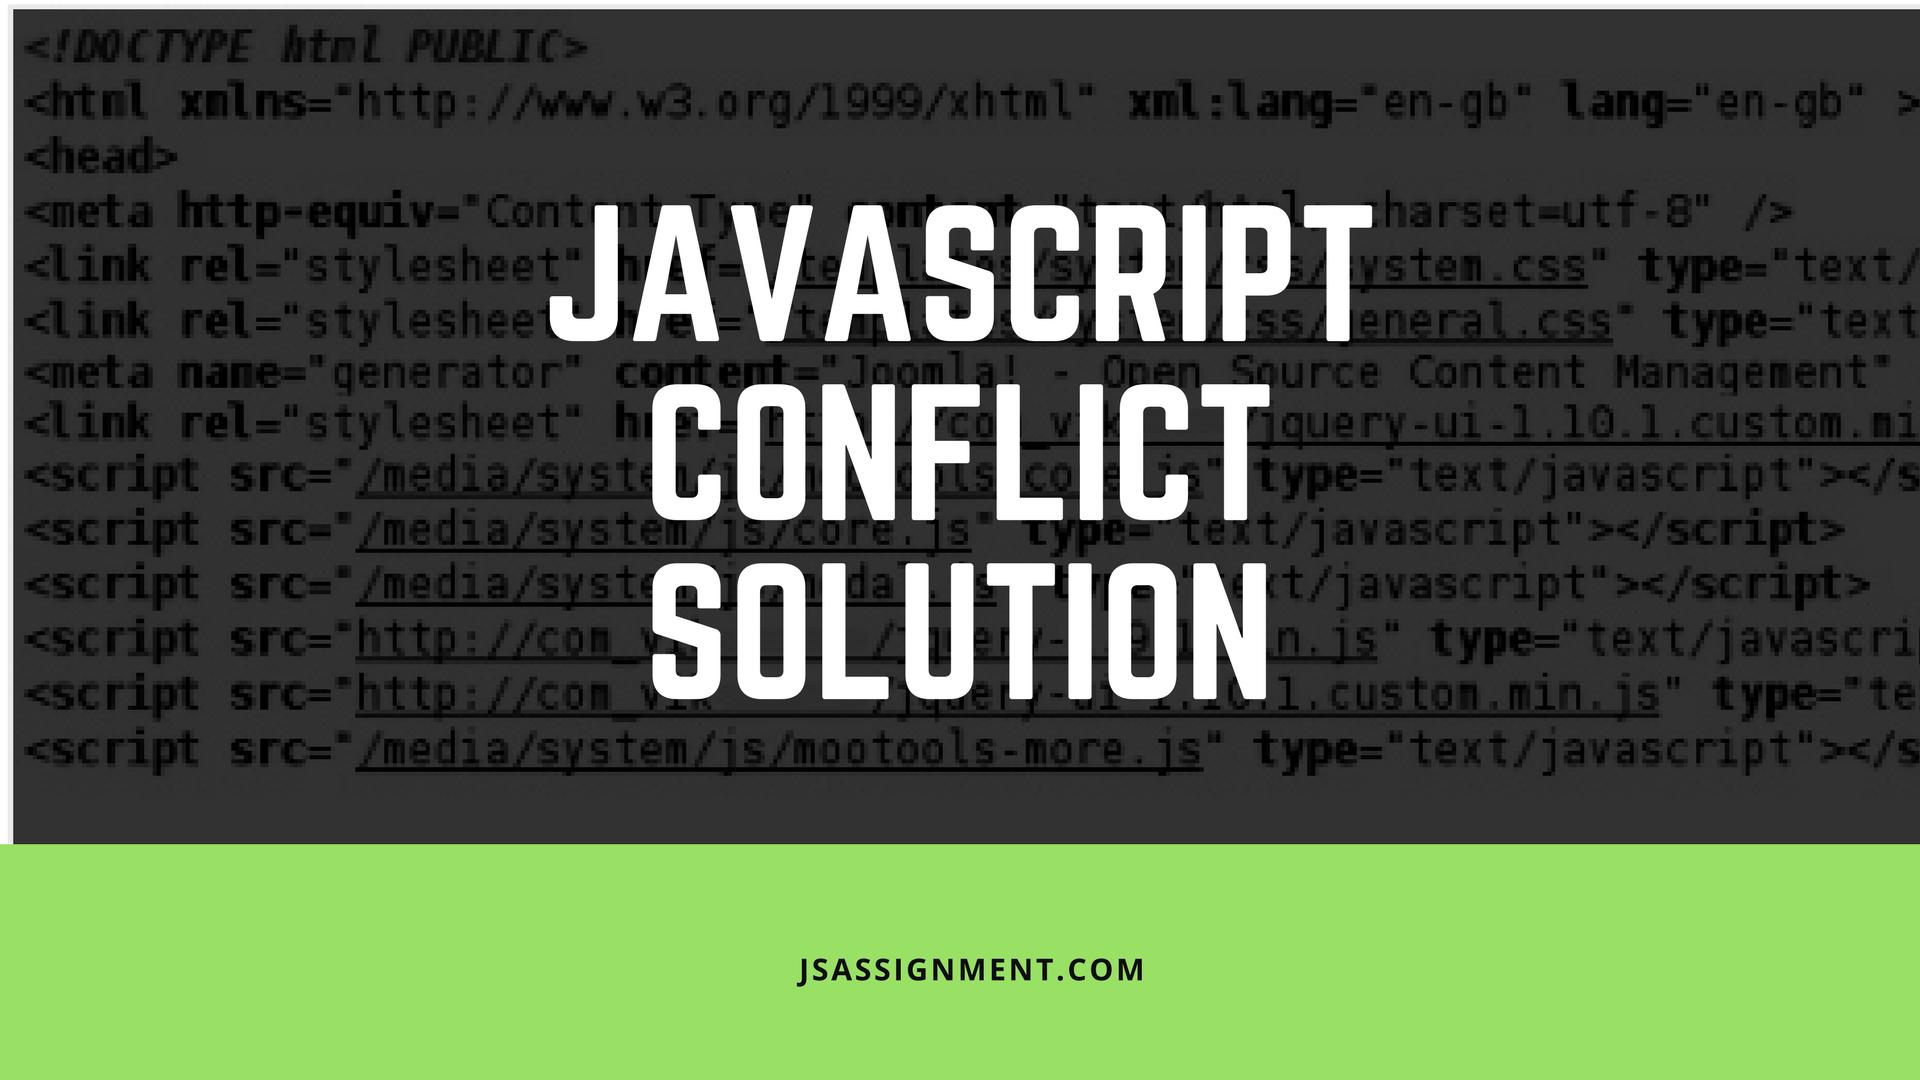 javascript conflict solution advice